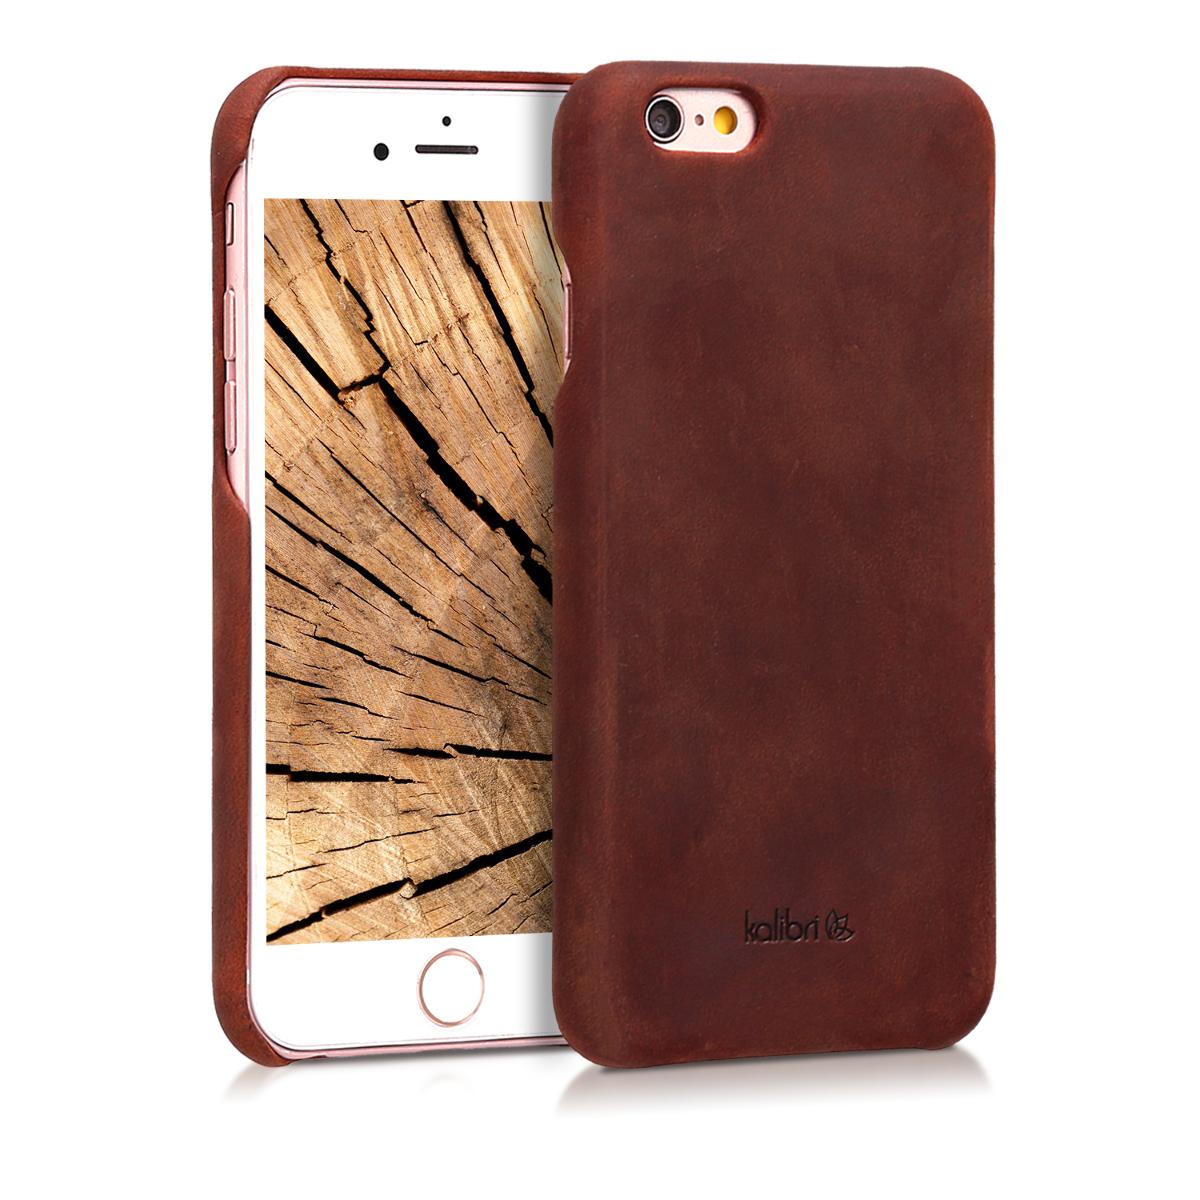 Kalibri Σκληρή Δερμάτινη Θήκη iPhone 6 / 6S - Bordeaux (38961.13)